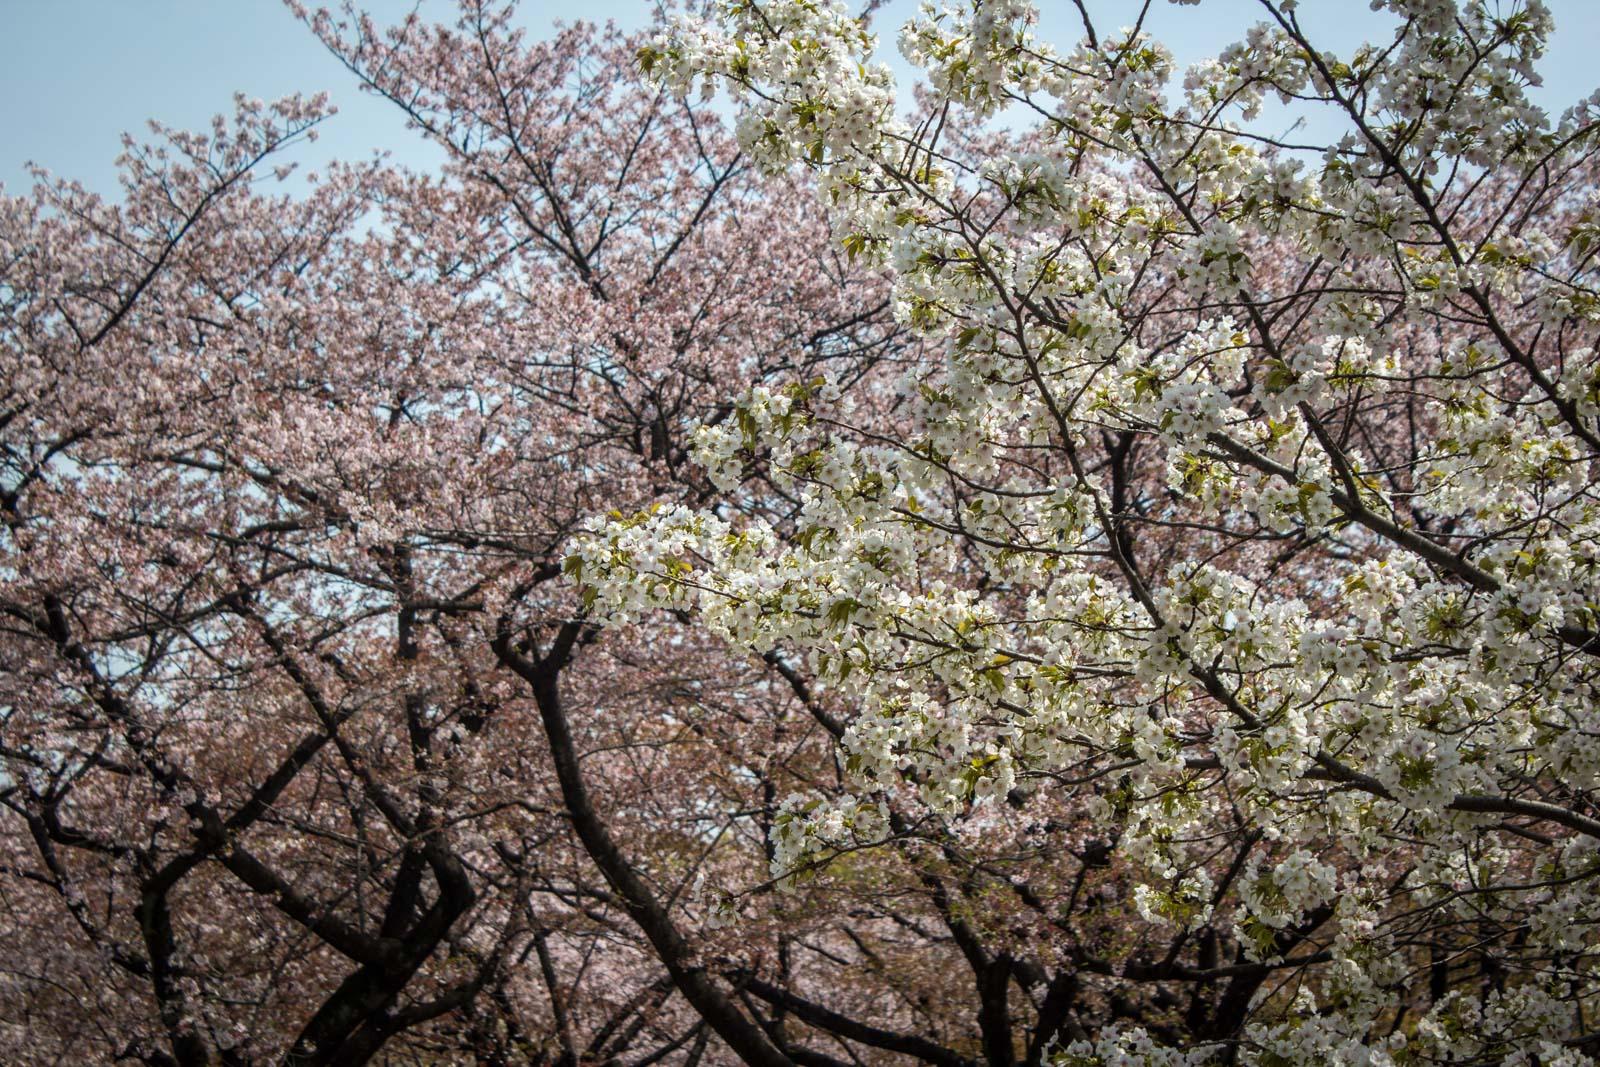 cherry blossoms, japan, sakura, hanami, japanese pink flowers, tokyo